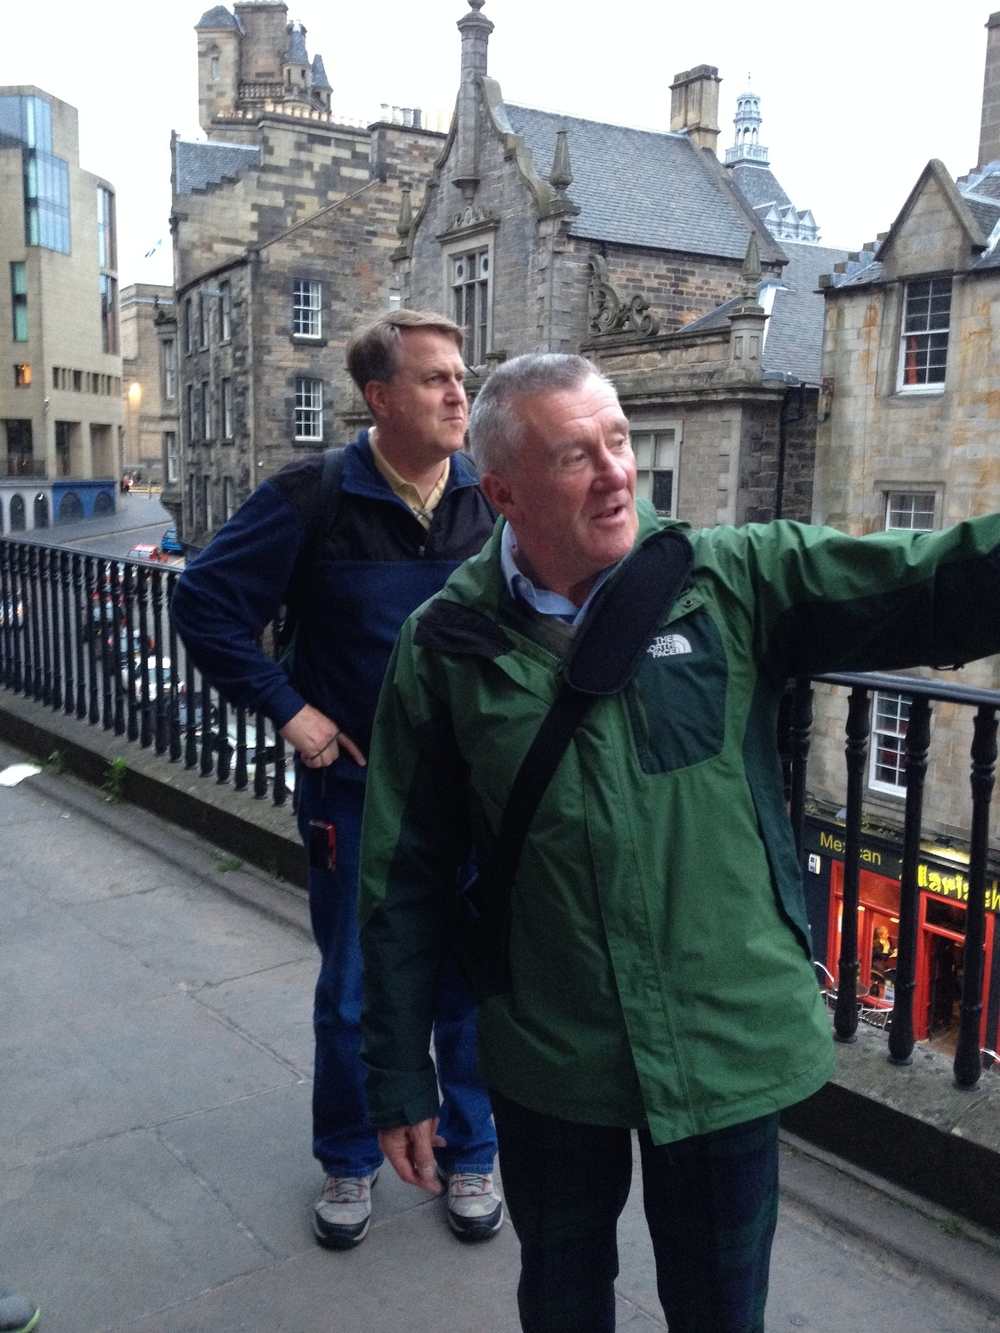 Saints and Sinners Tour, Edinburgh